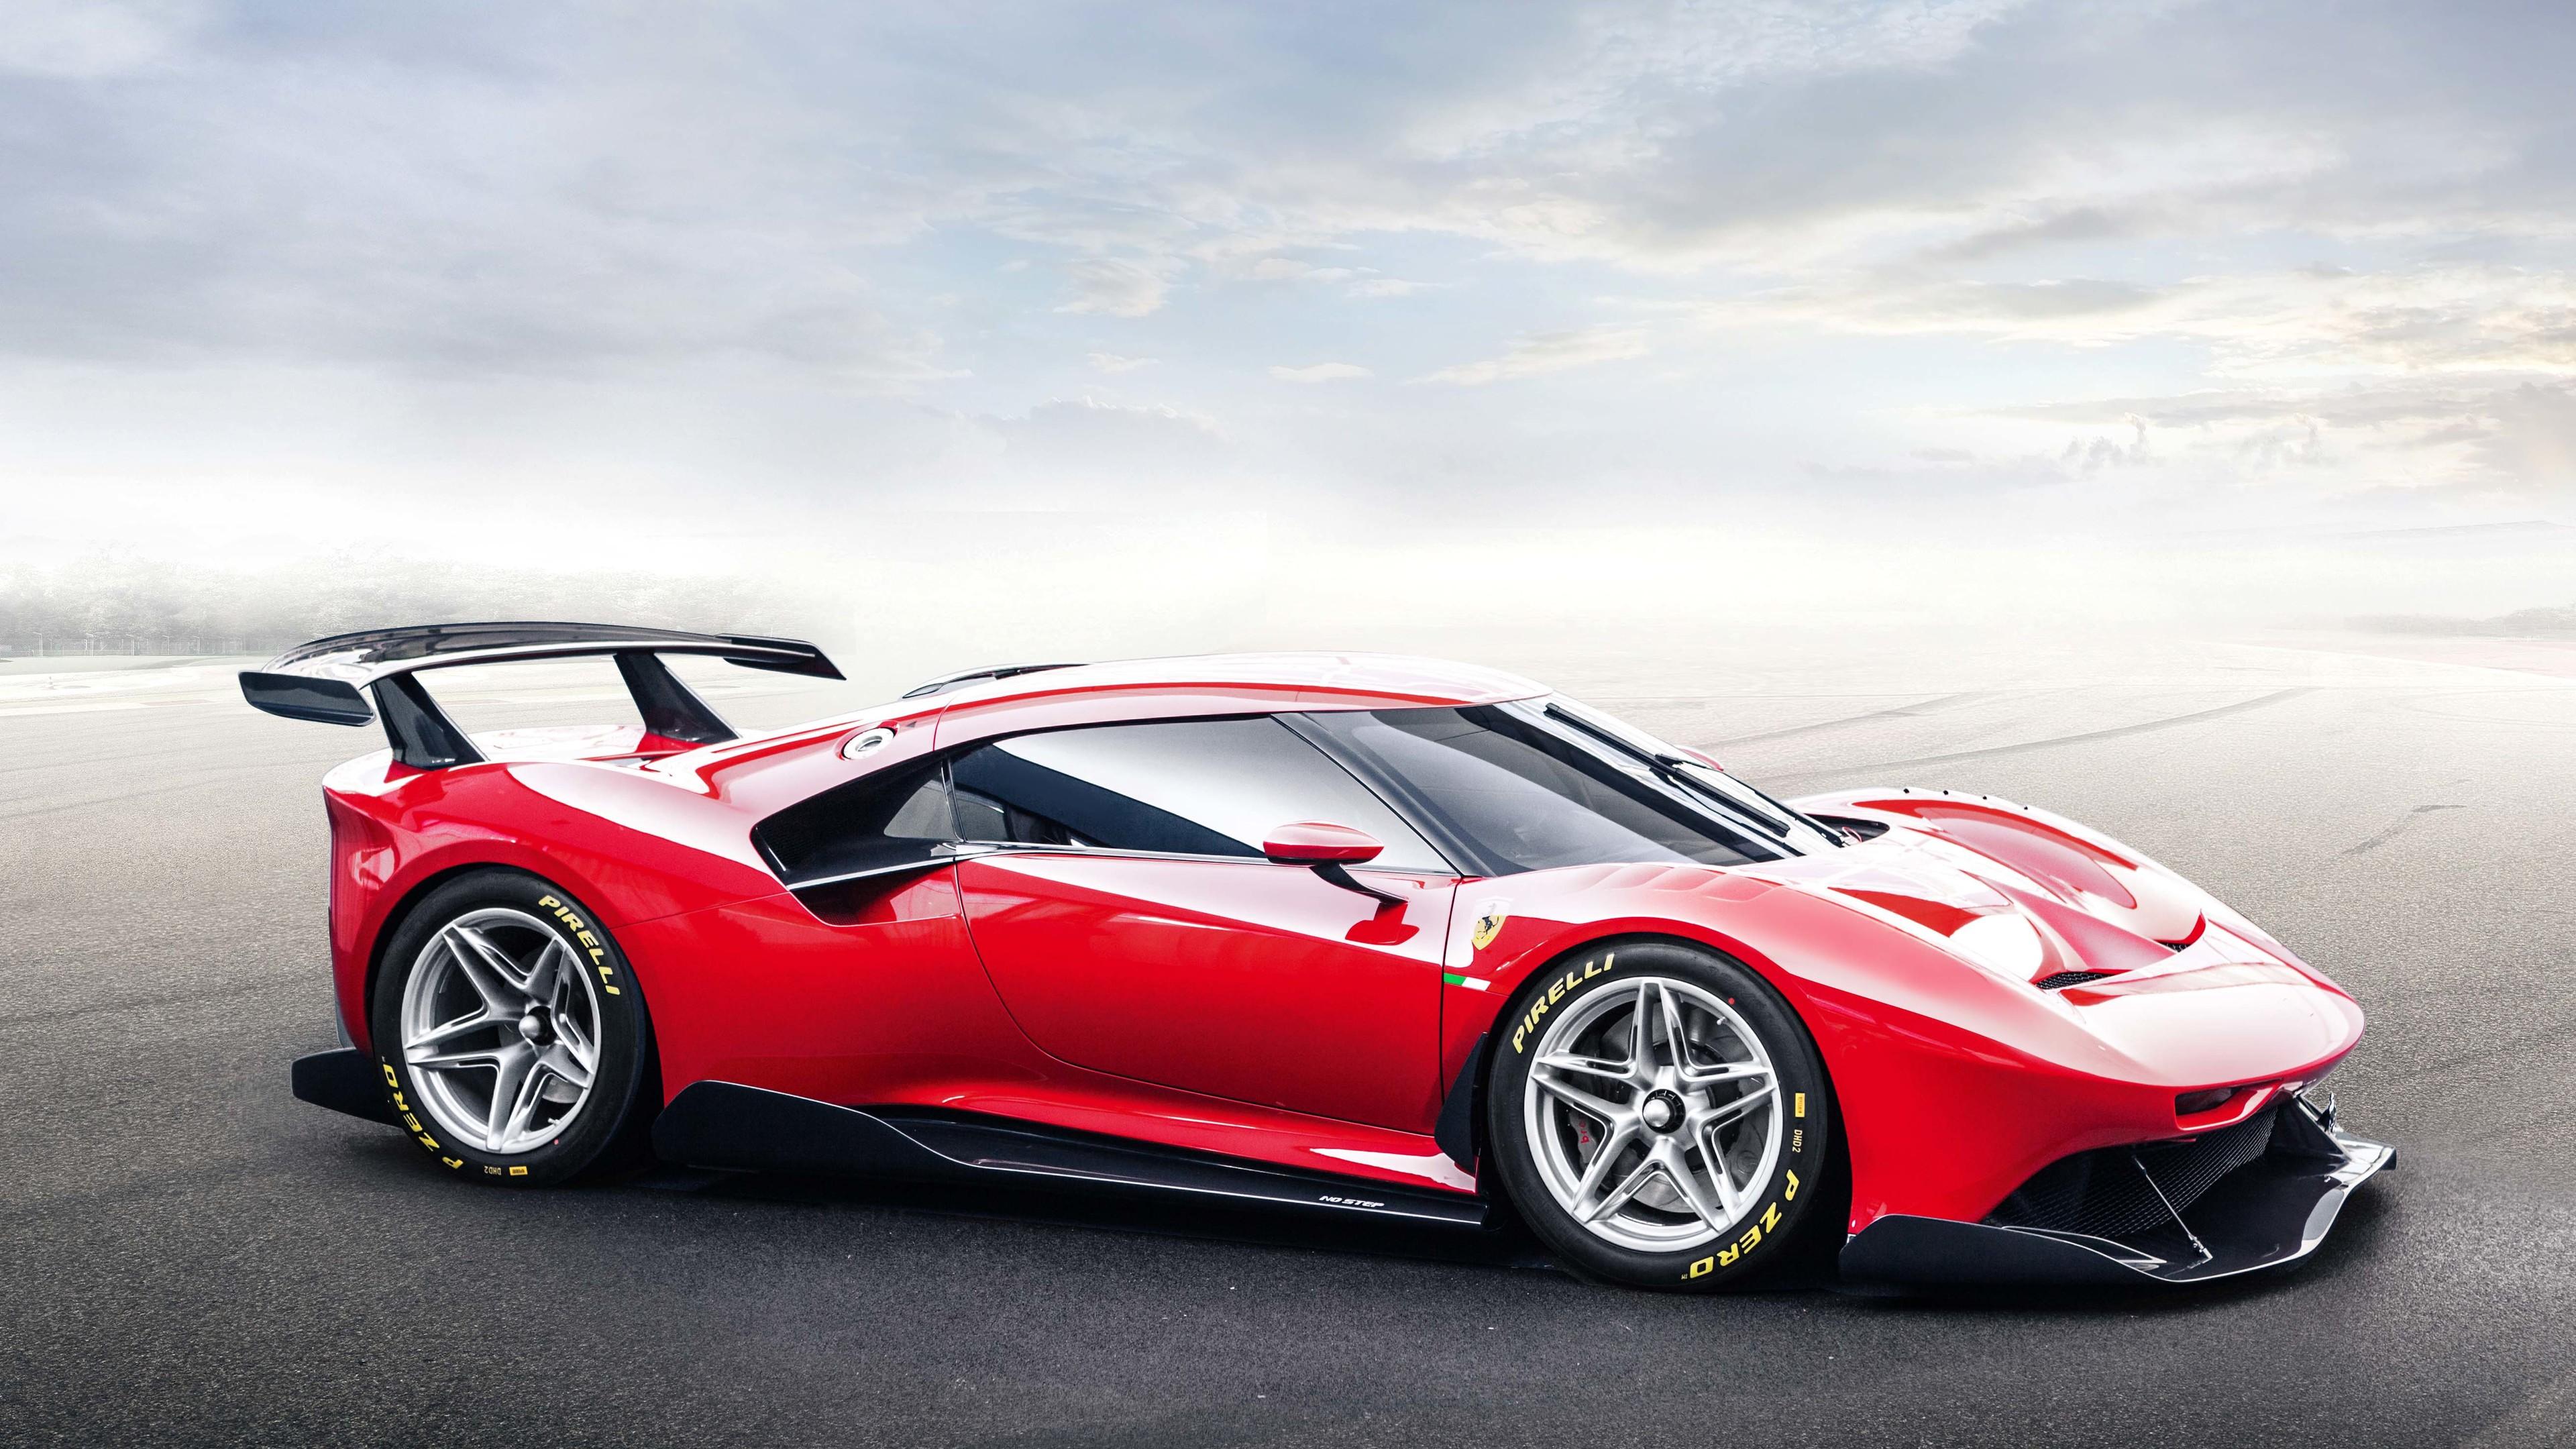 2019 ferrari p80 c 4k 1554245240 - 2019 Ferrari P80 C 4k - hd-wallpapers, ferrari wallpapers, ferrari p80 c wallpapers, cars wallpapers, 5k wallpapers, 4k-wallpapers, 2019 cars wallpapers